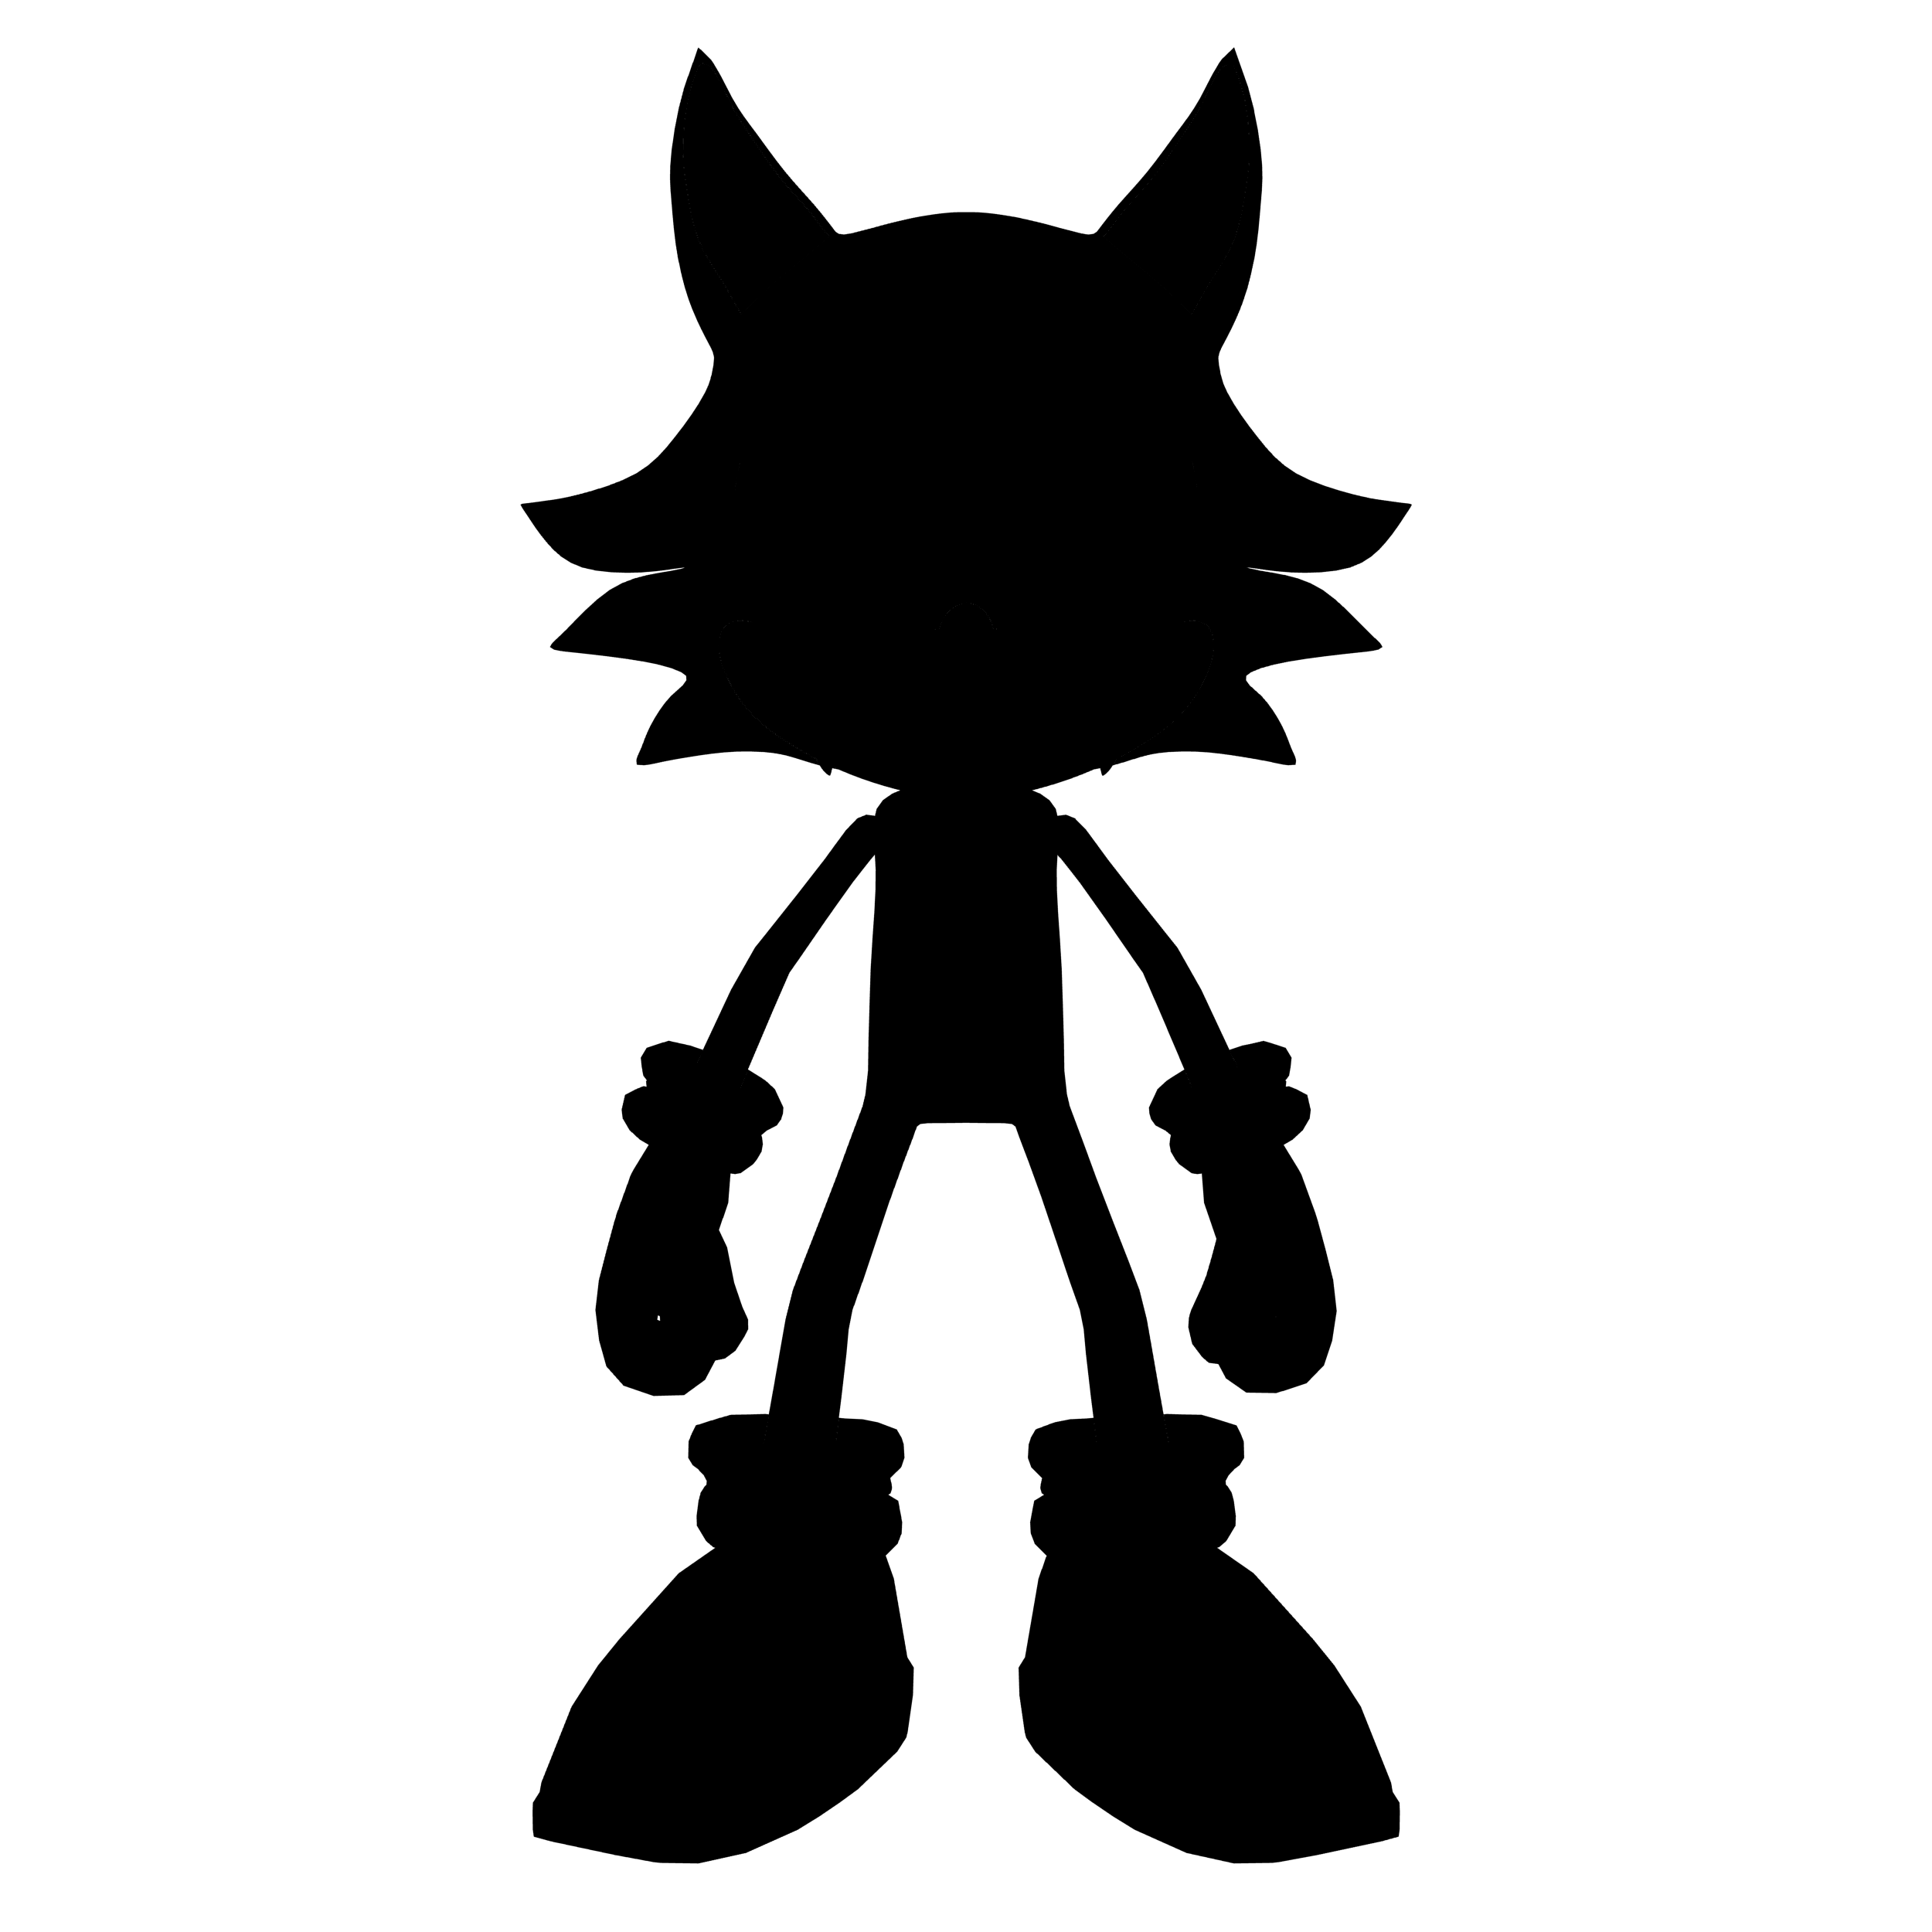 black sonic